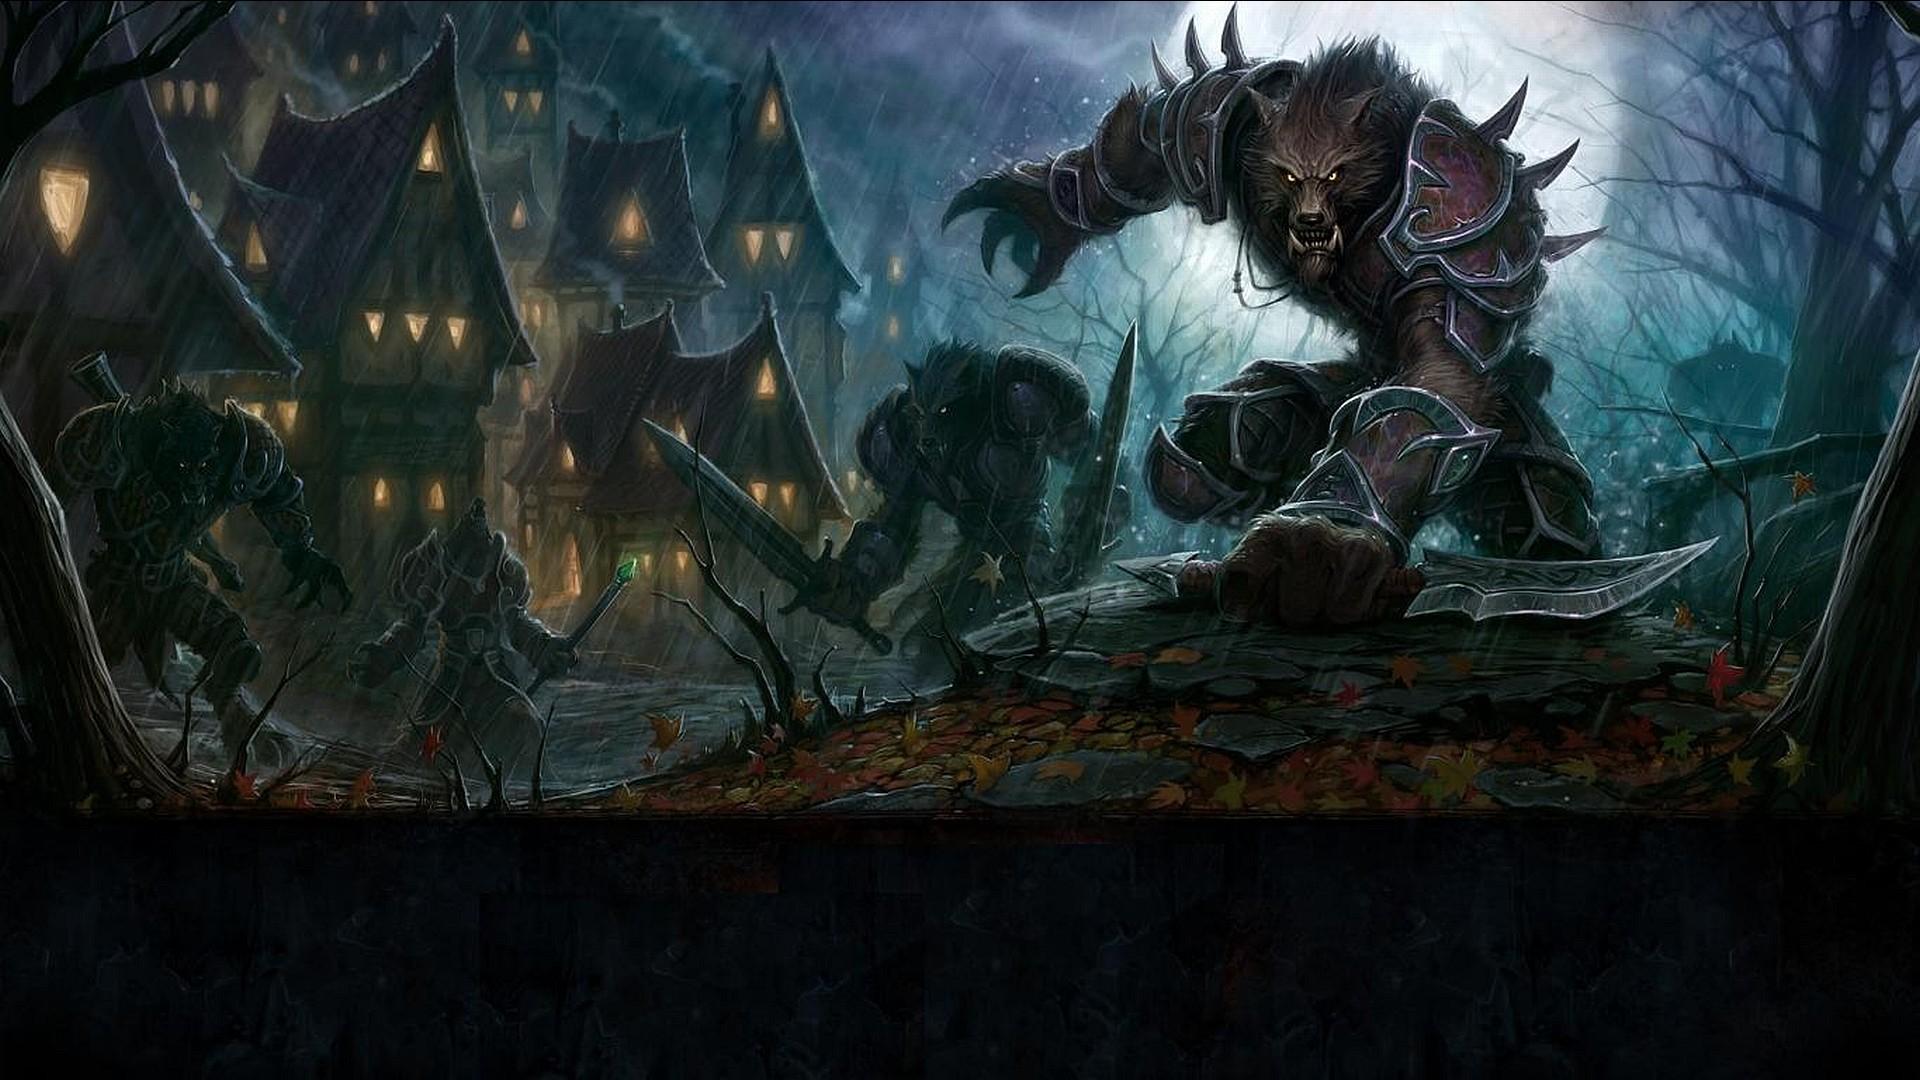 Nocturnal Clash wallpaper from Werewolf wallpapers Evil HD | Wallpapers 4k  | Pinterest | Werewolves and Wallpaper